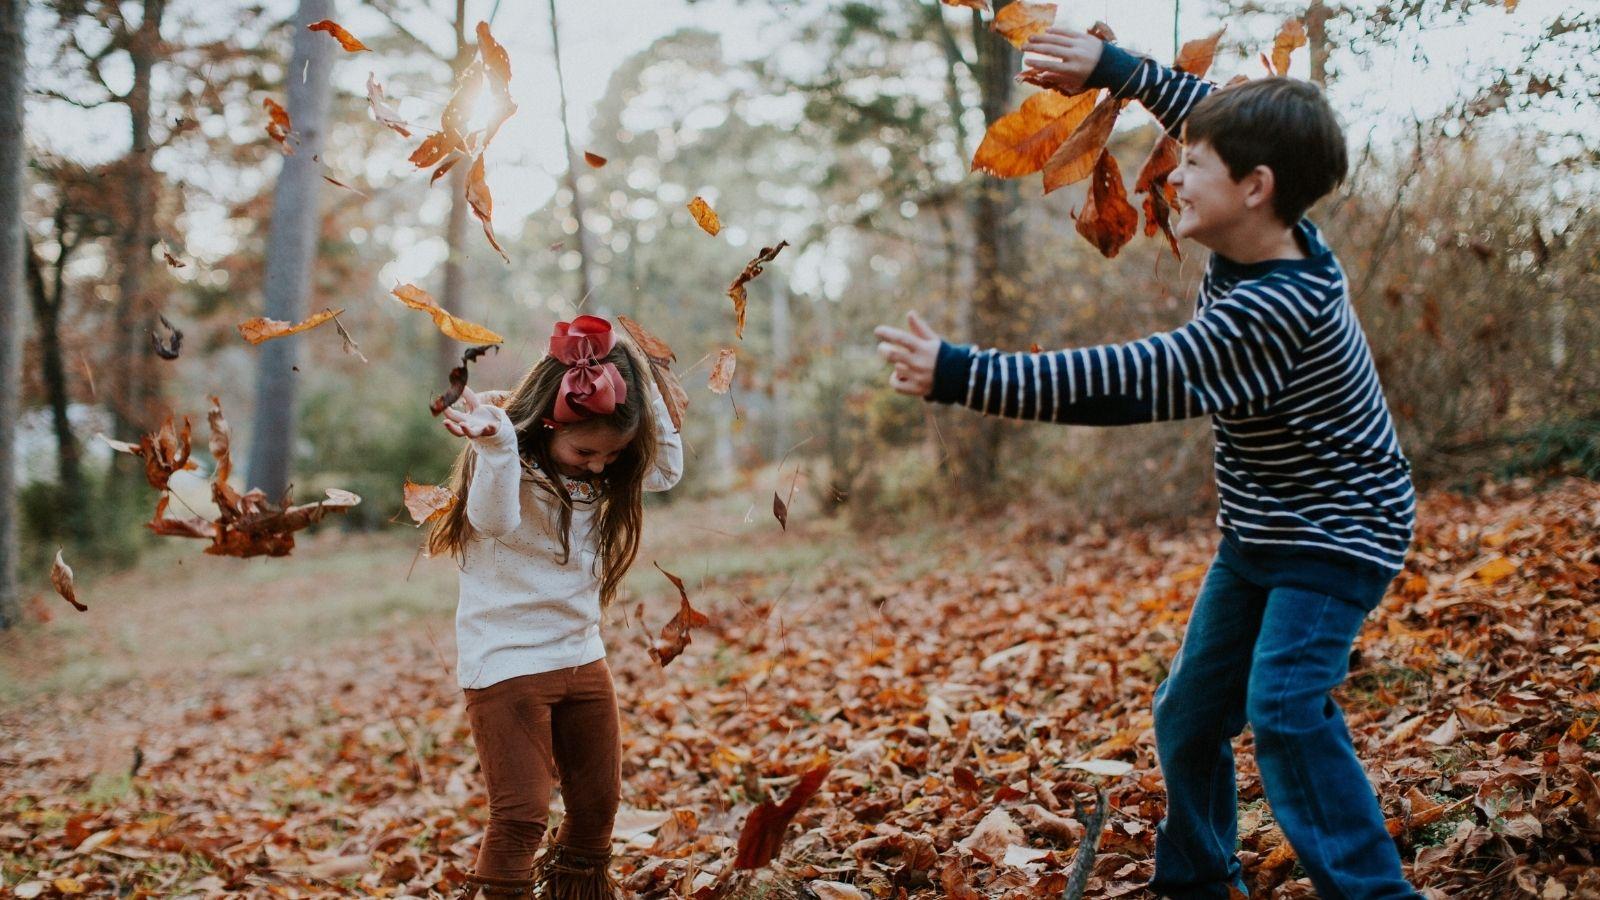 Kids playing together on a New England fall getaway (Photo: @hannitary via Twenty20)